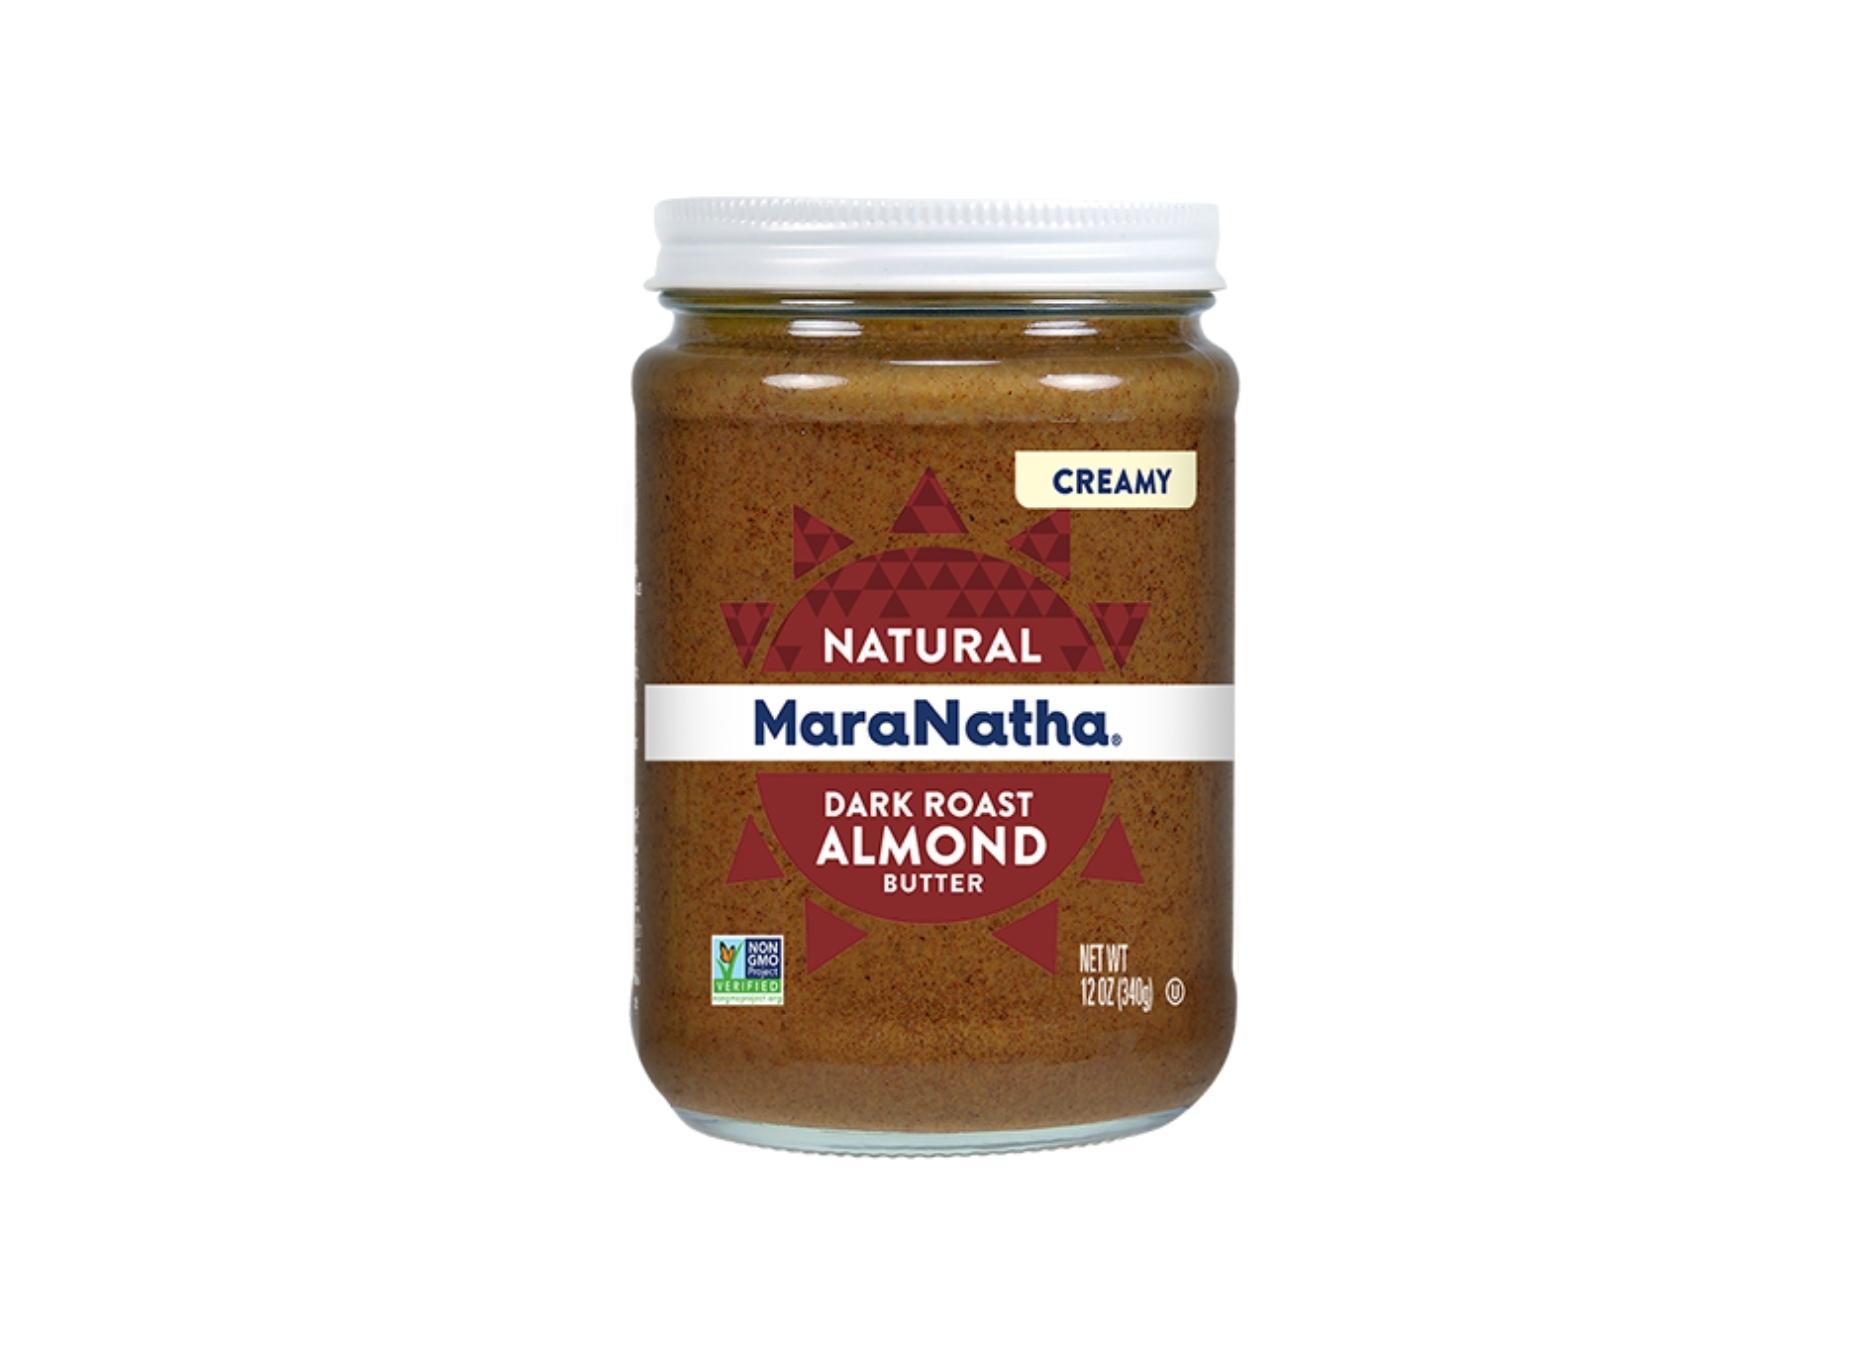 MaraNatha Nut Butter